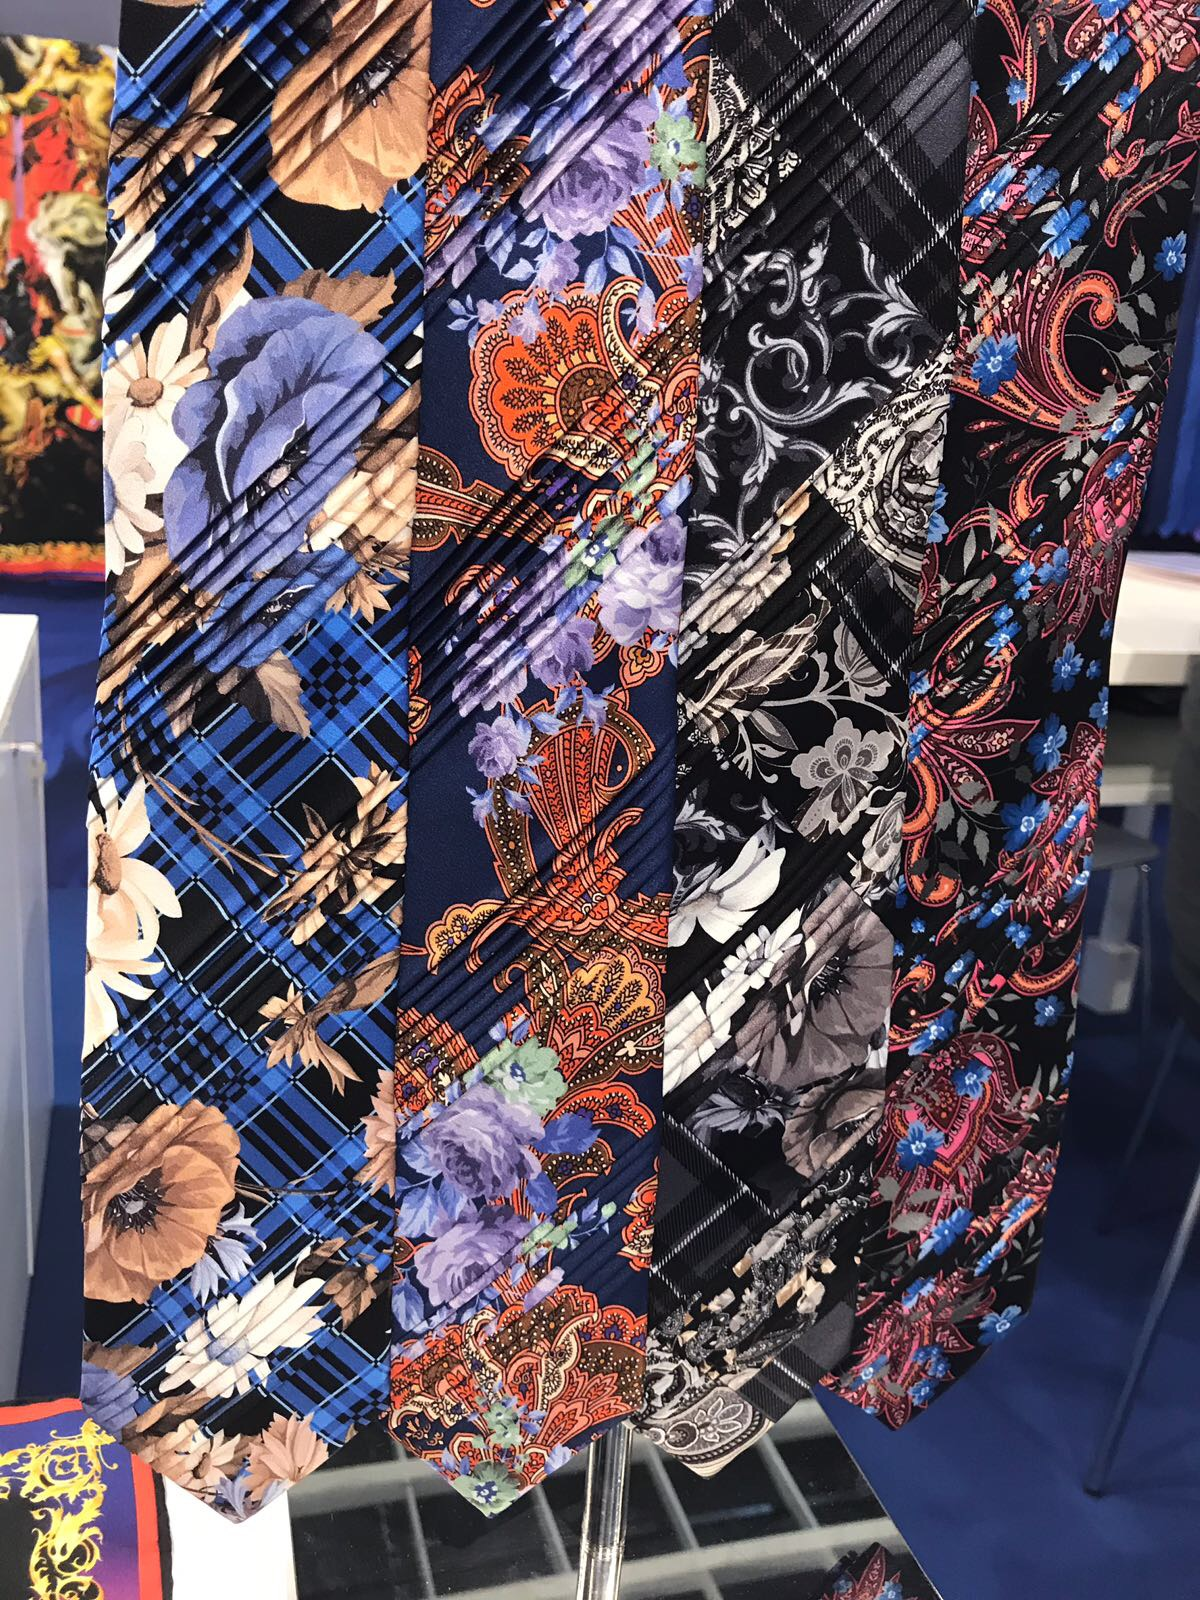 Pleated ties hanging on wall display.